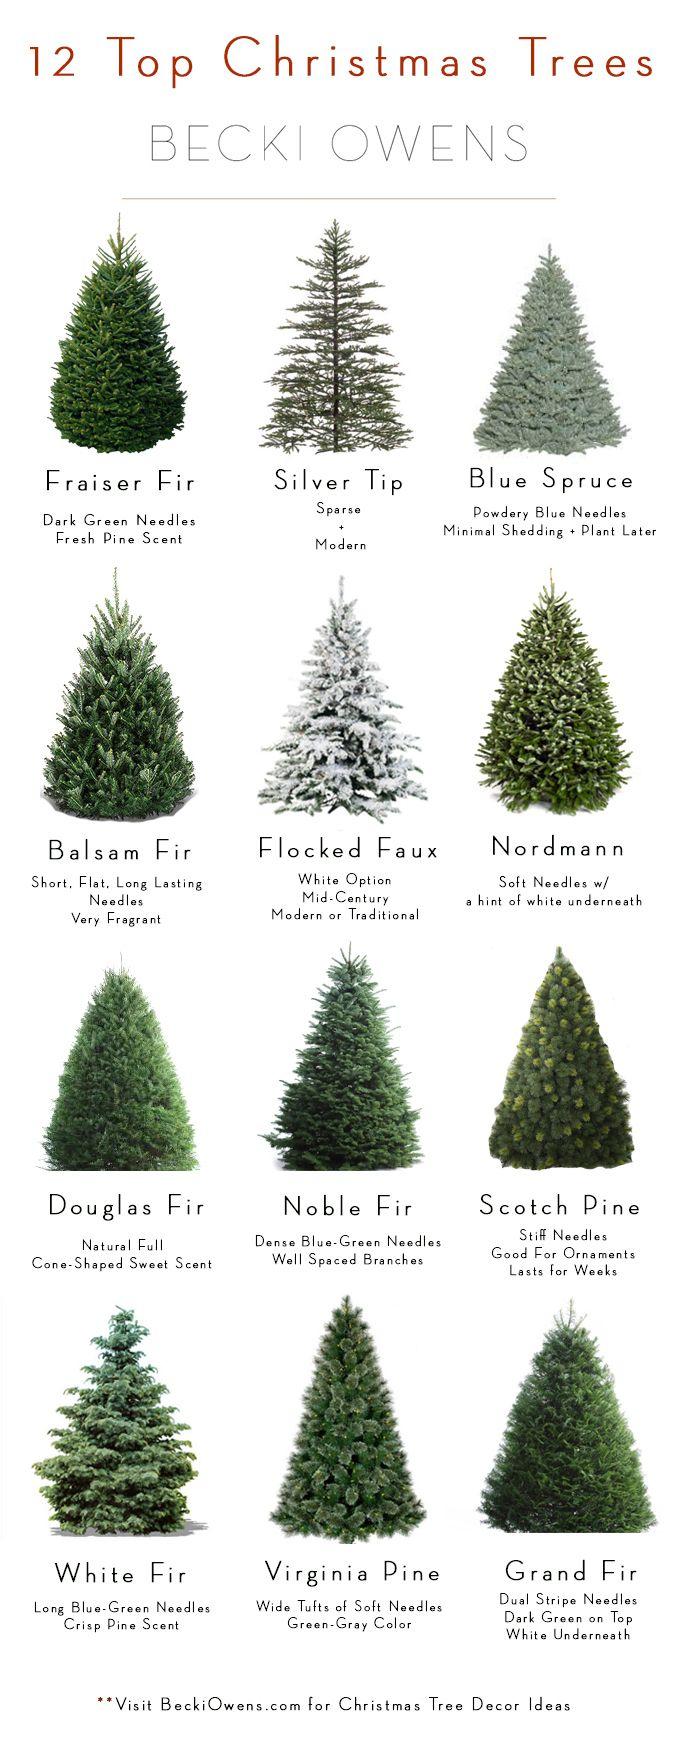 BECKI OWENS- Tree Guide: Top 12 Christmas Trees